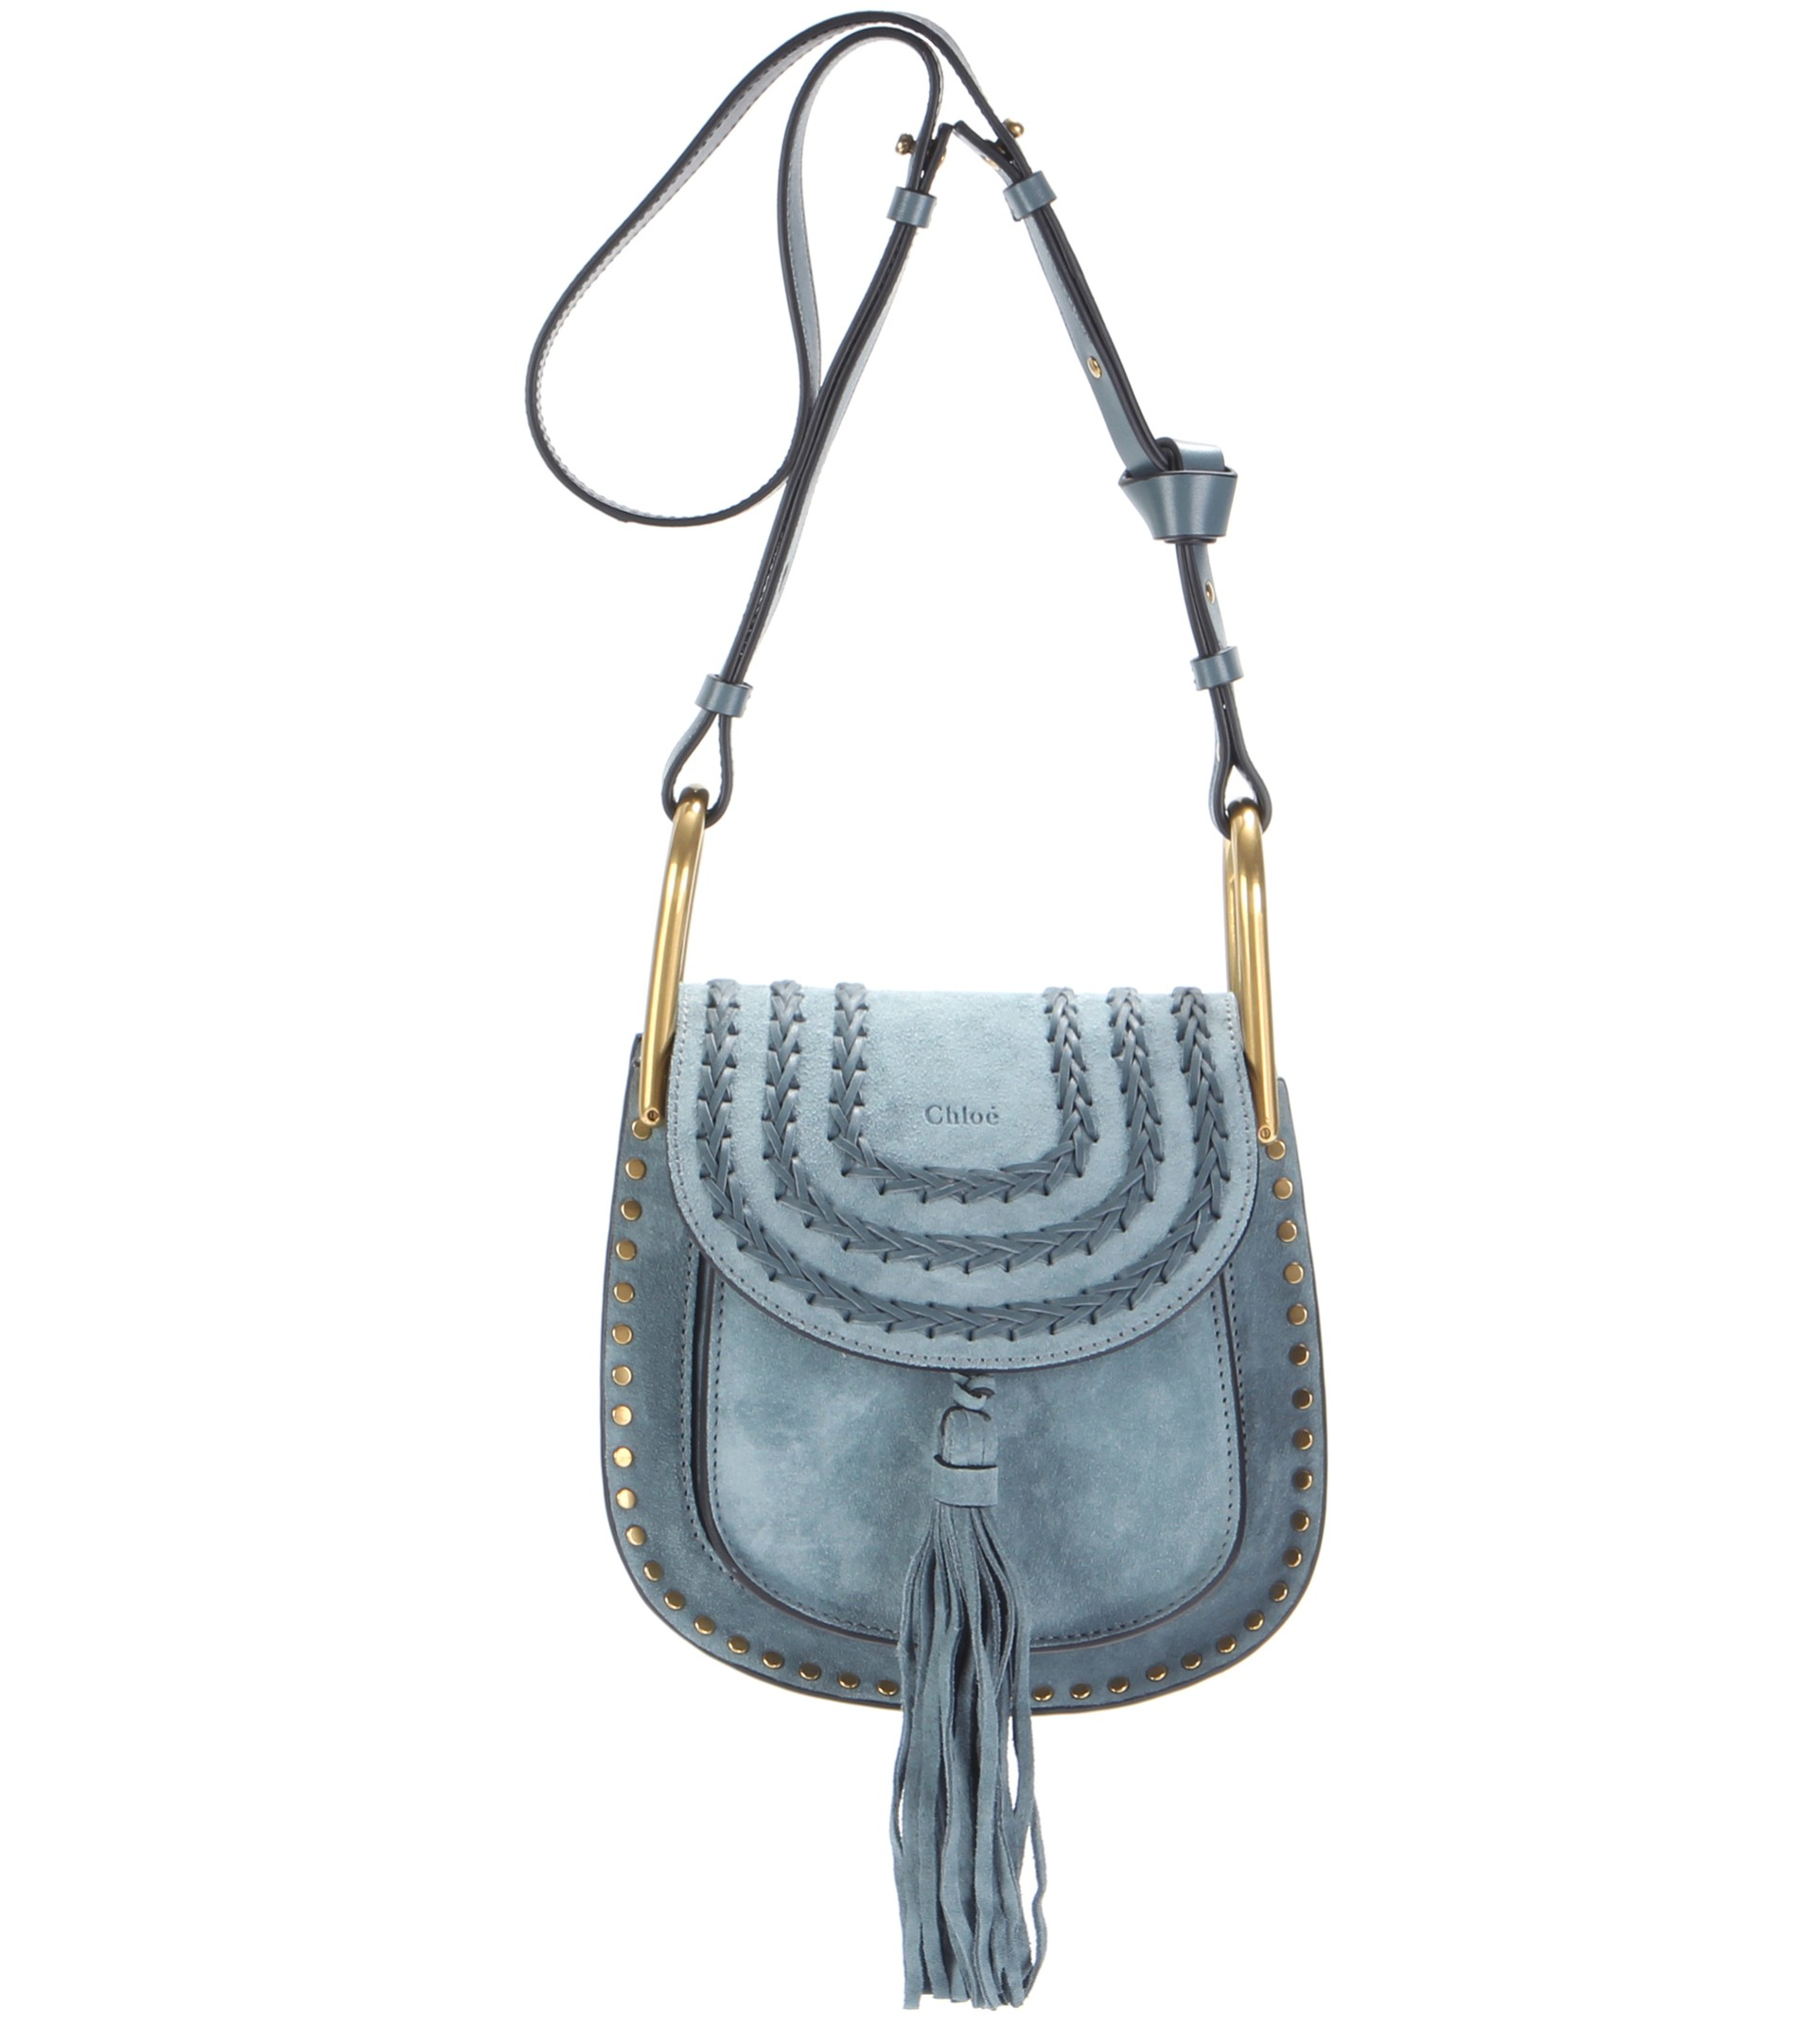 d6372ada7d2 Lyst - Chloé Hudson Small Suede Shoulder Bag in Blue